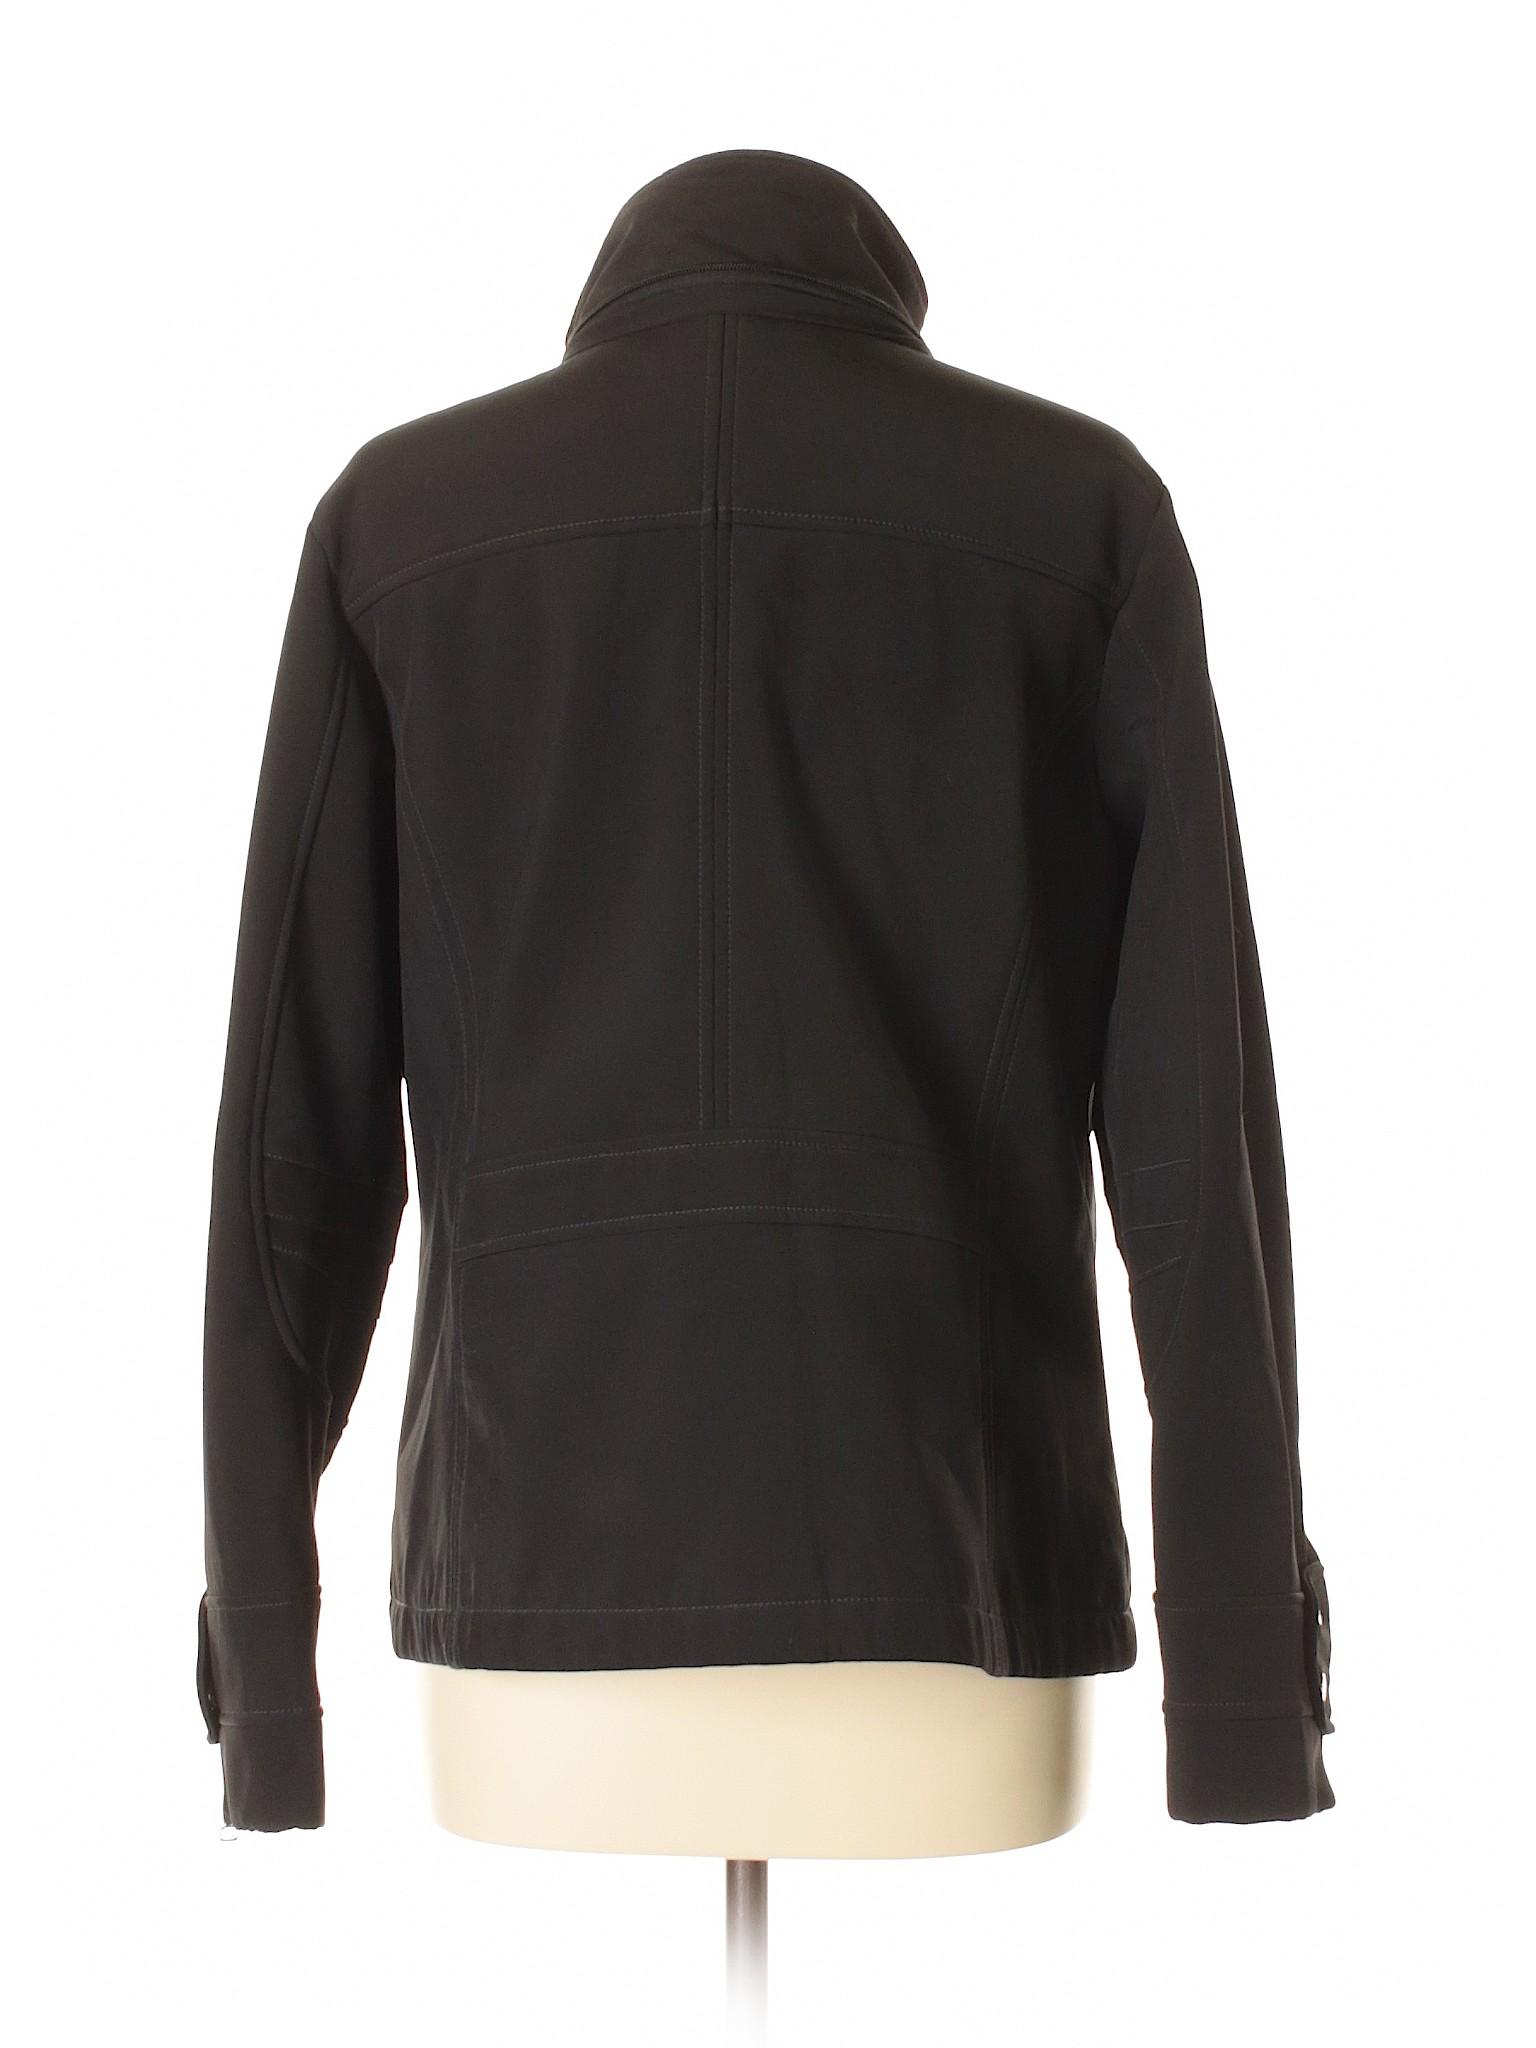 Jacket Vertical'9 winter Boutique winter Boutique Xw0xR